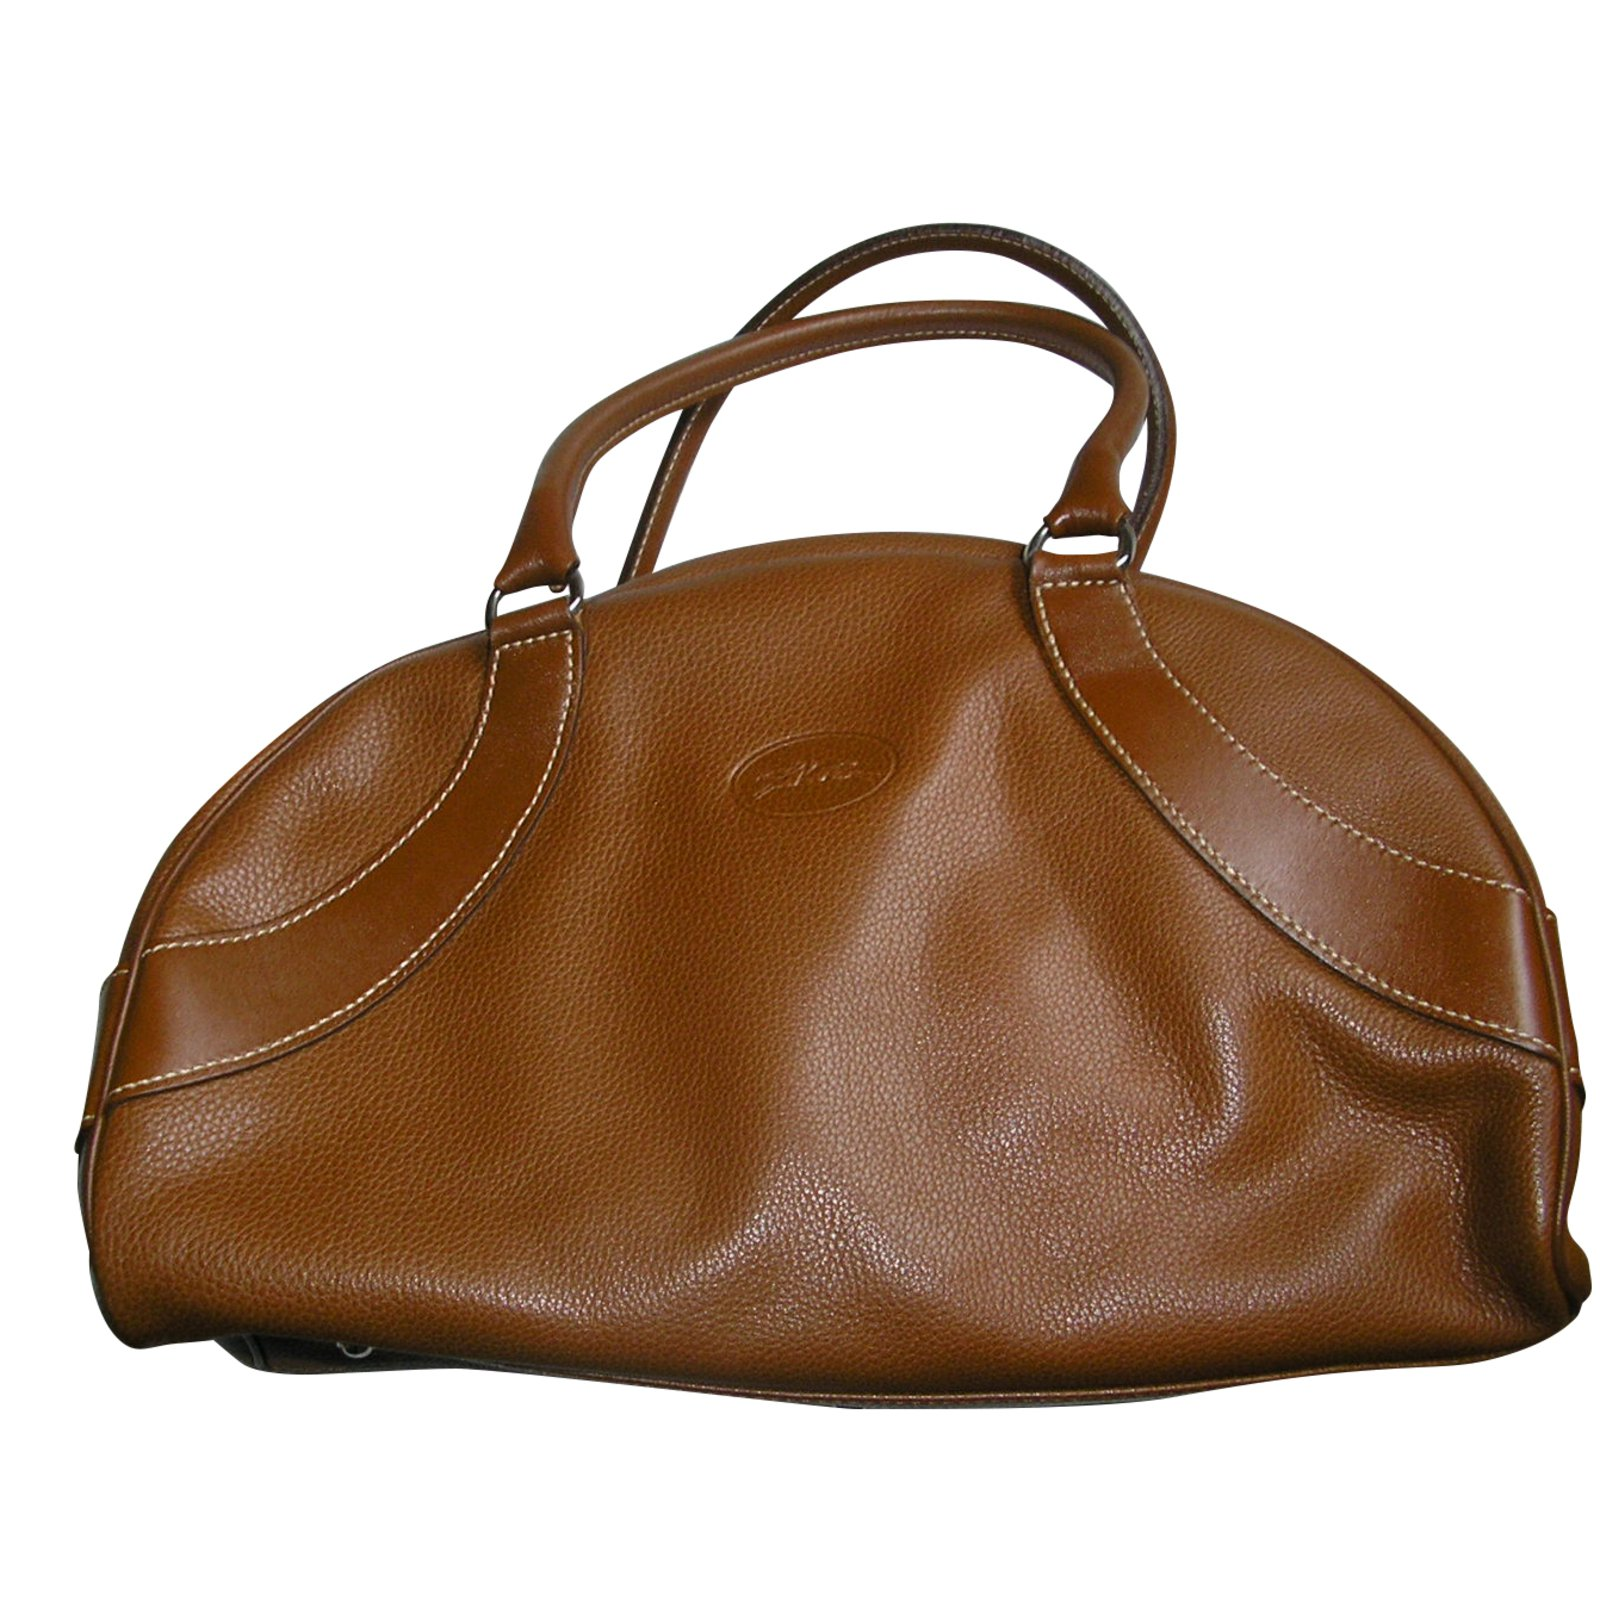 Caramello Bowling Longchamp Leather Borse Ref Caramel Borsa gv4wwCq